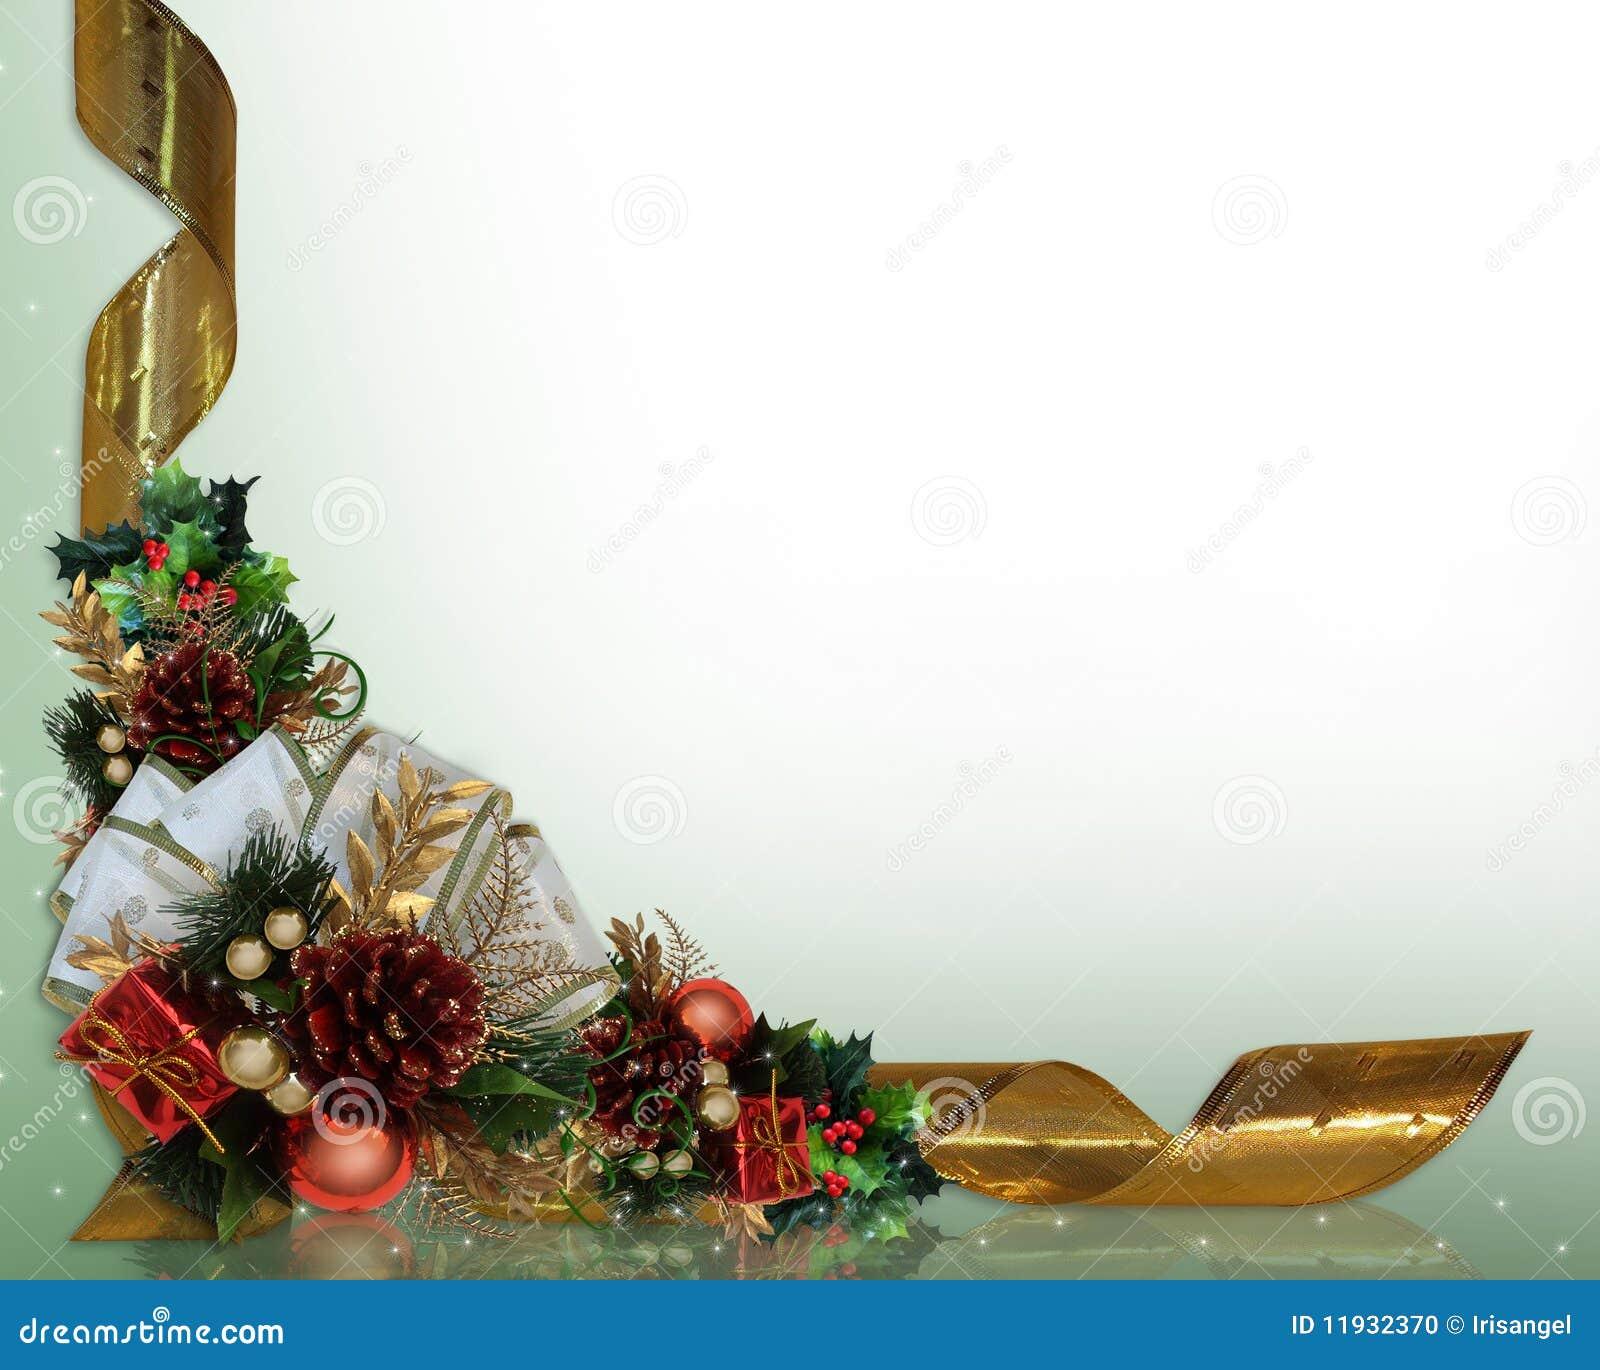 ... holiday greeting card, invitation, stationery, Christmas border